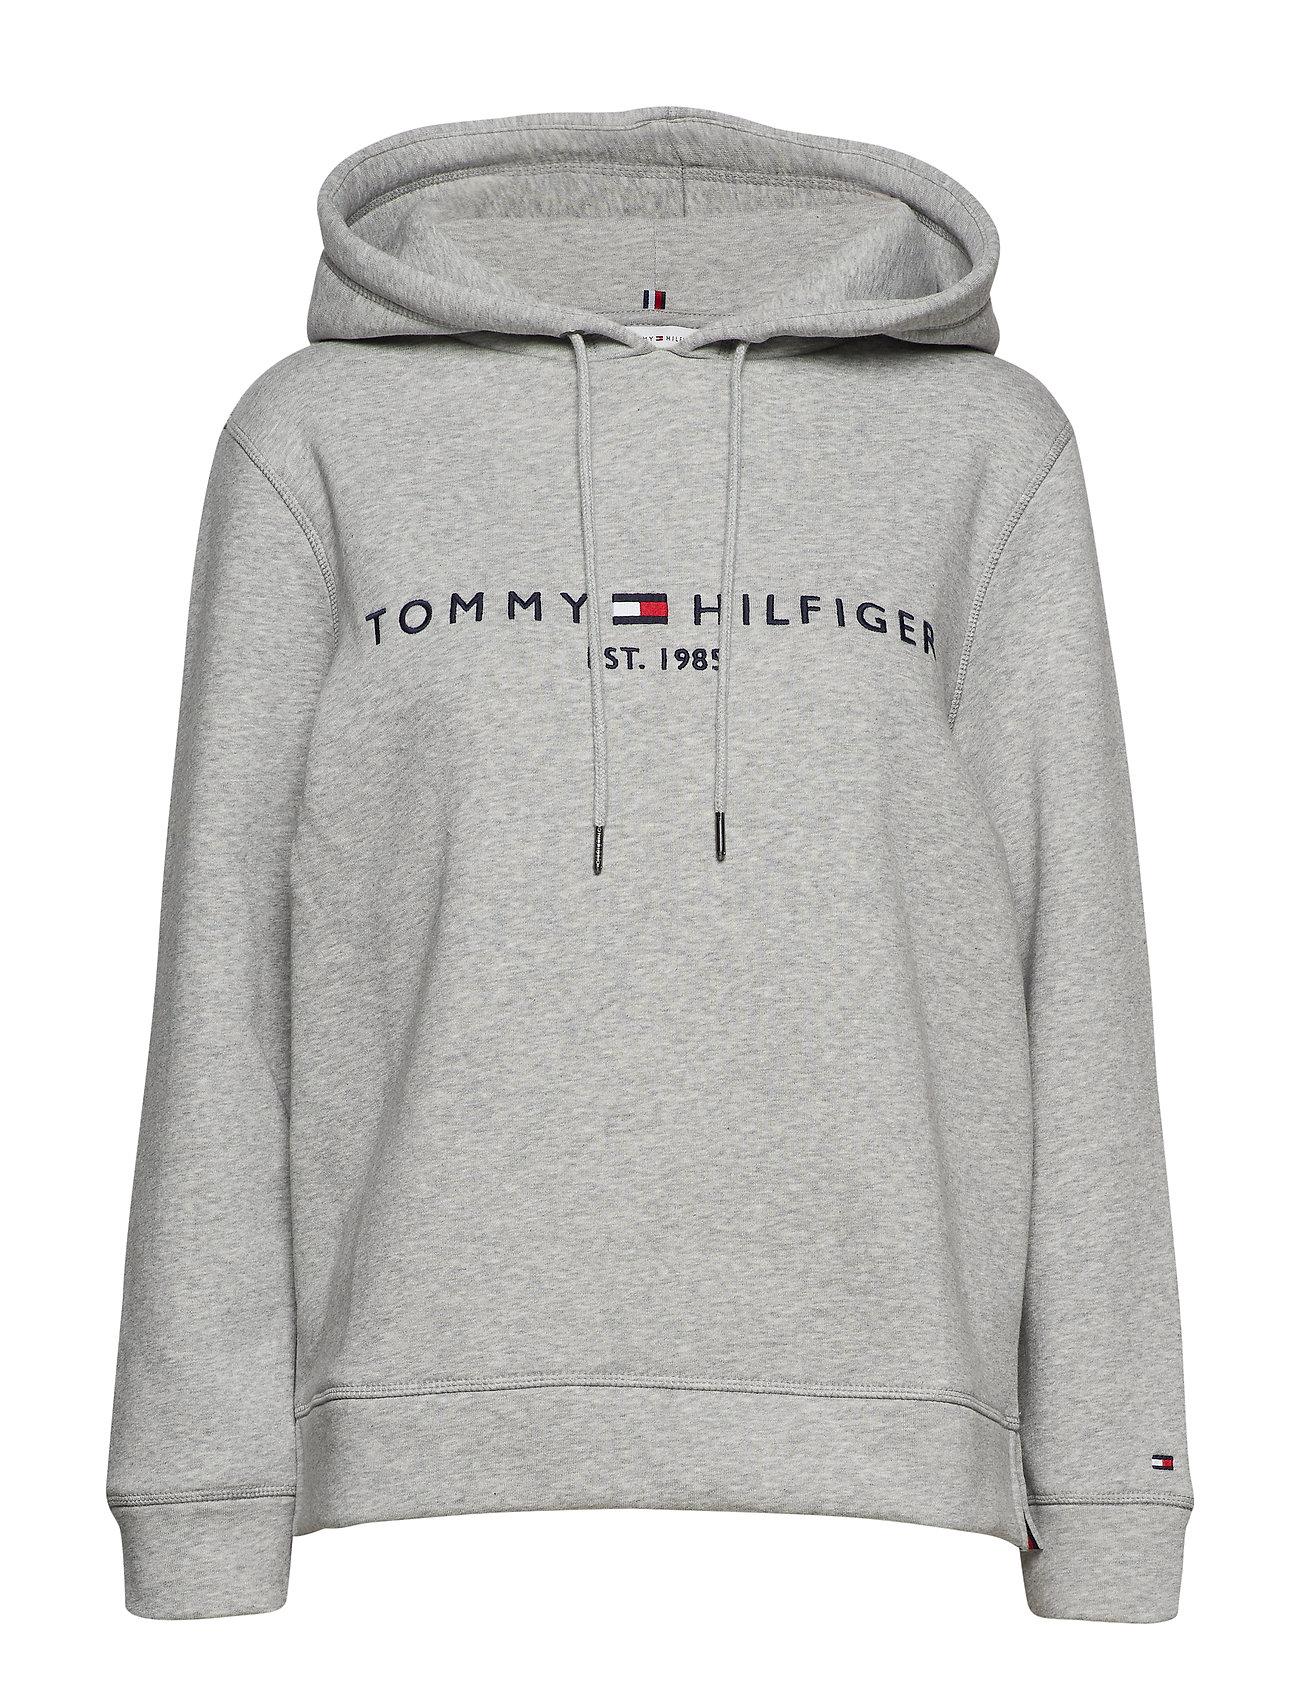 Tommy Hilfiger TH ESS HILFIGER HOOD - LIGHT GREY HEATHER